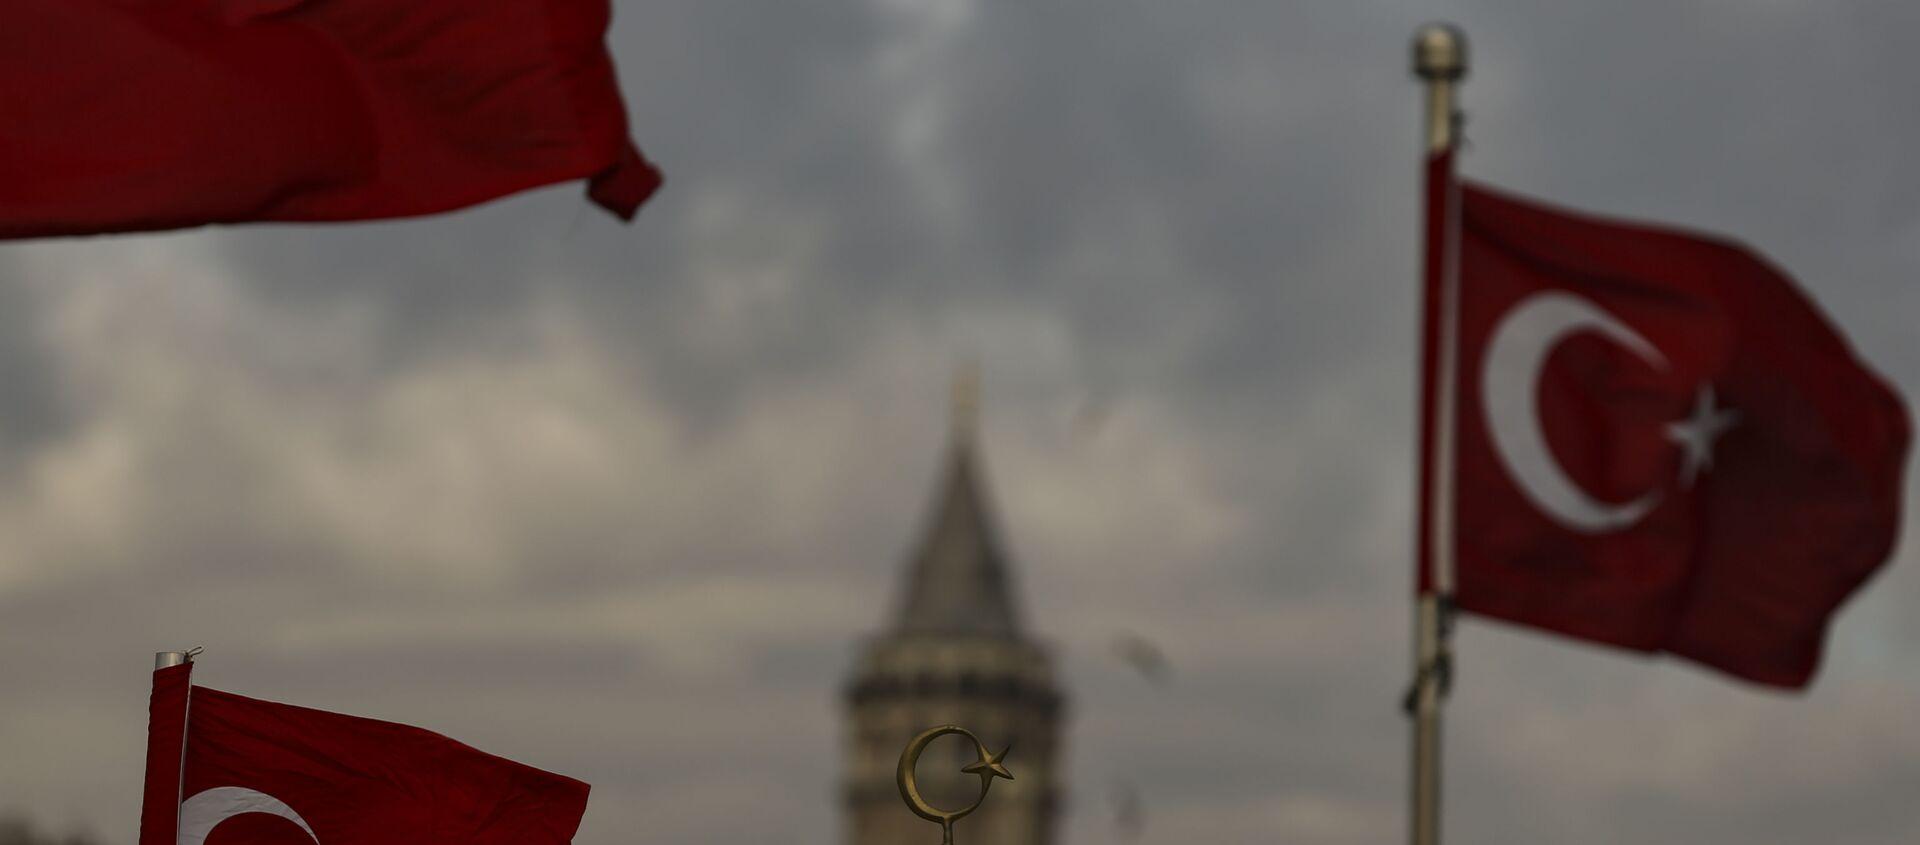 Вид на Стамбул, фото из архива - Sputnik Азербайджан, 1920, 26.04.2021